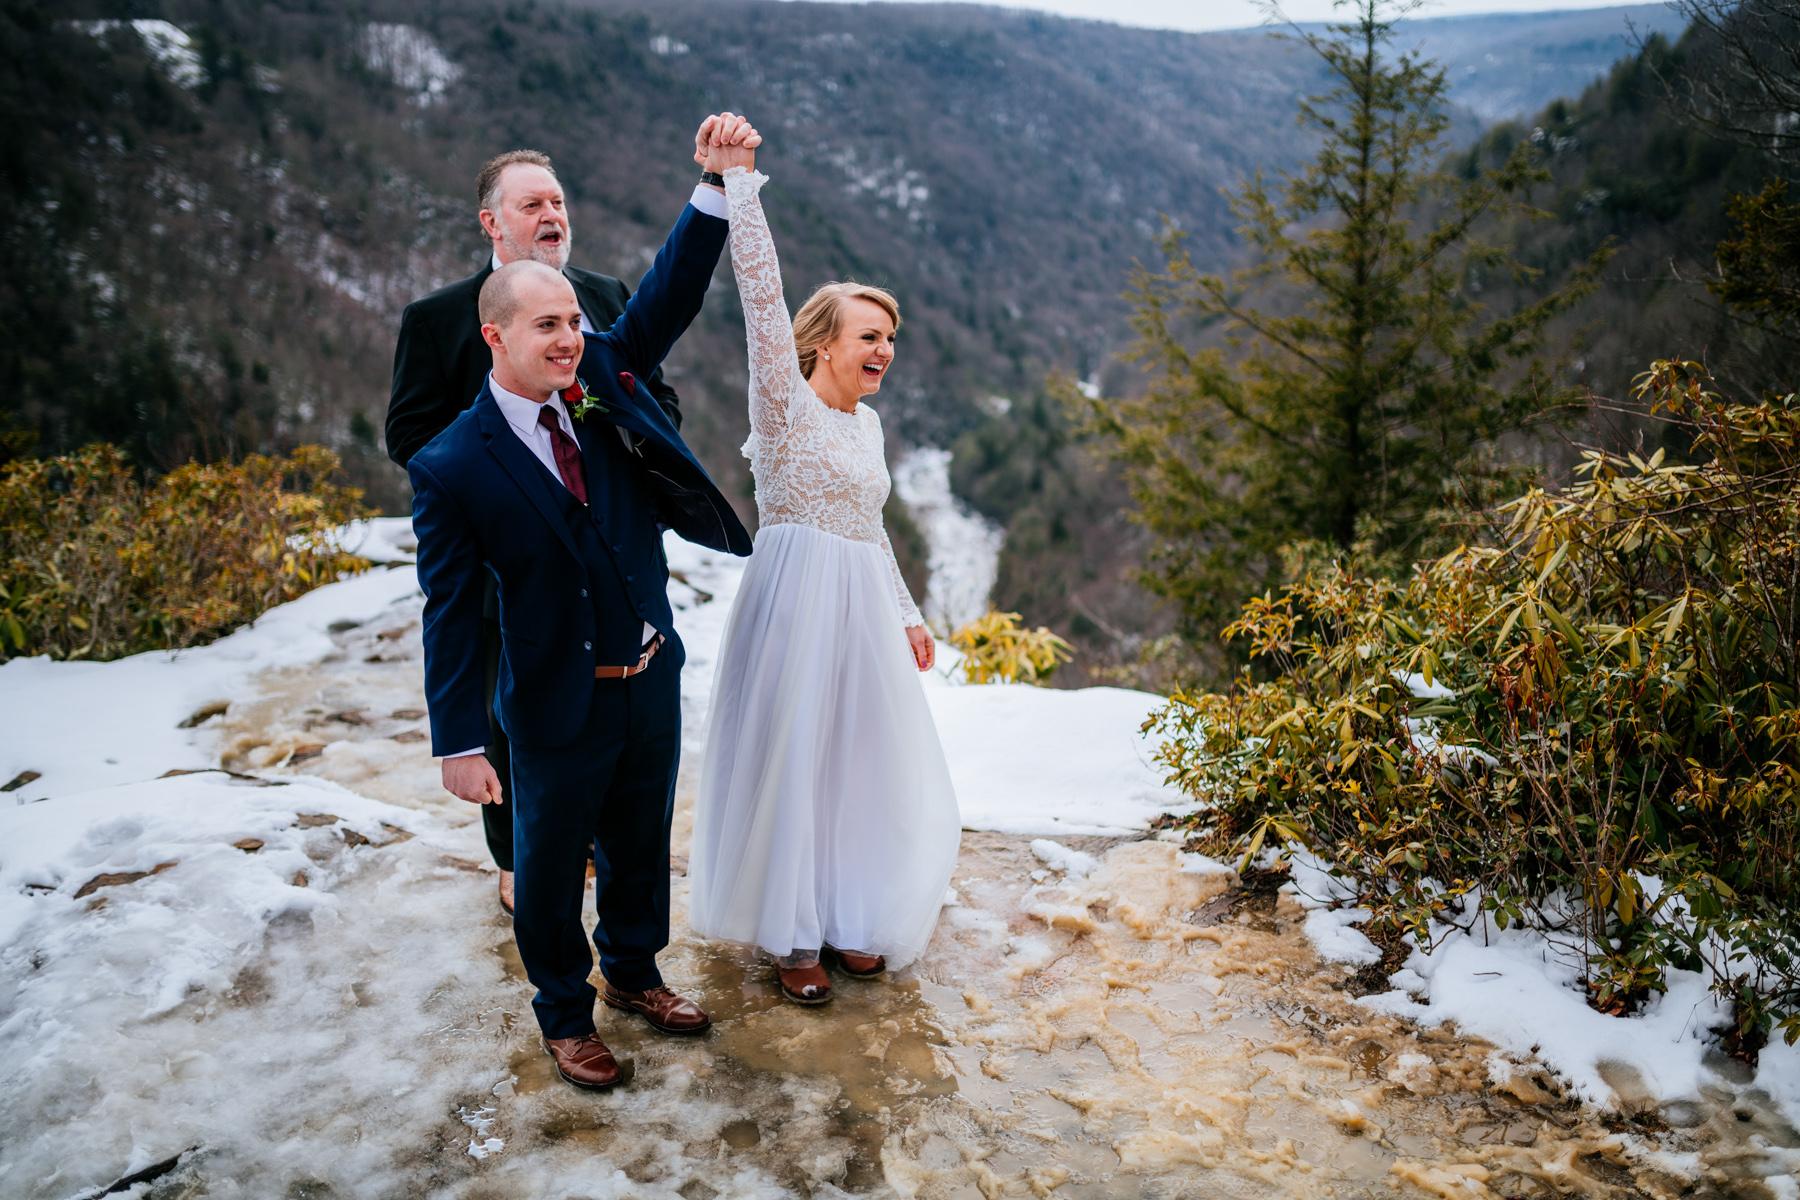 pendleton point wedding couple raising hands